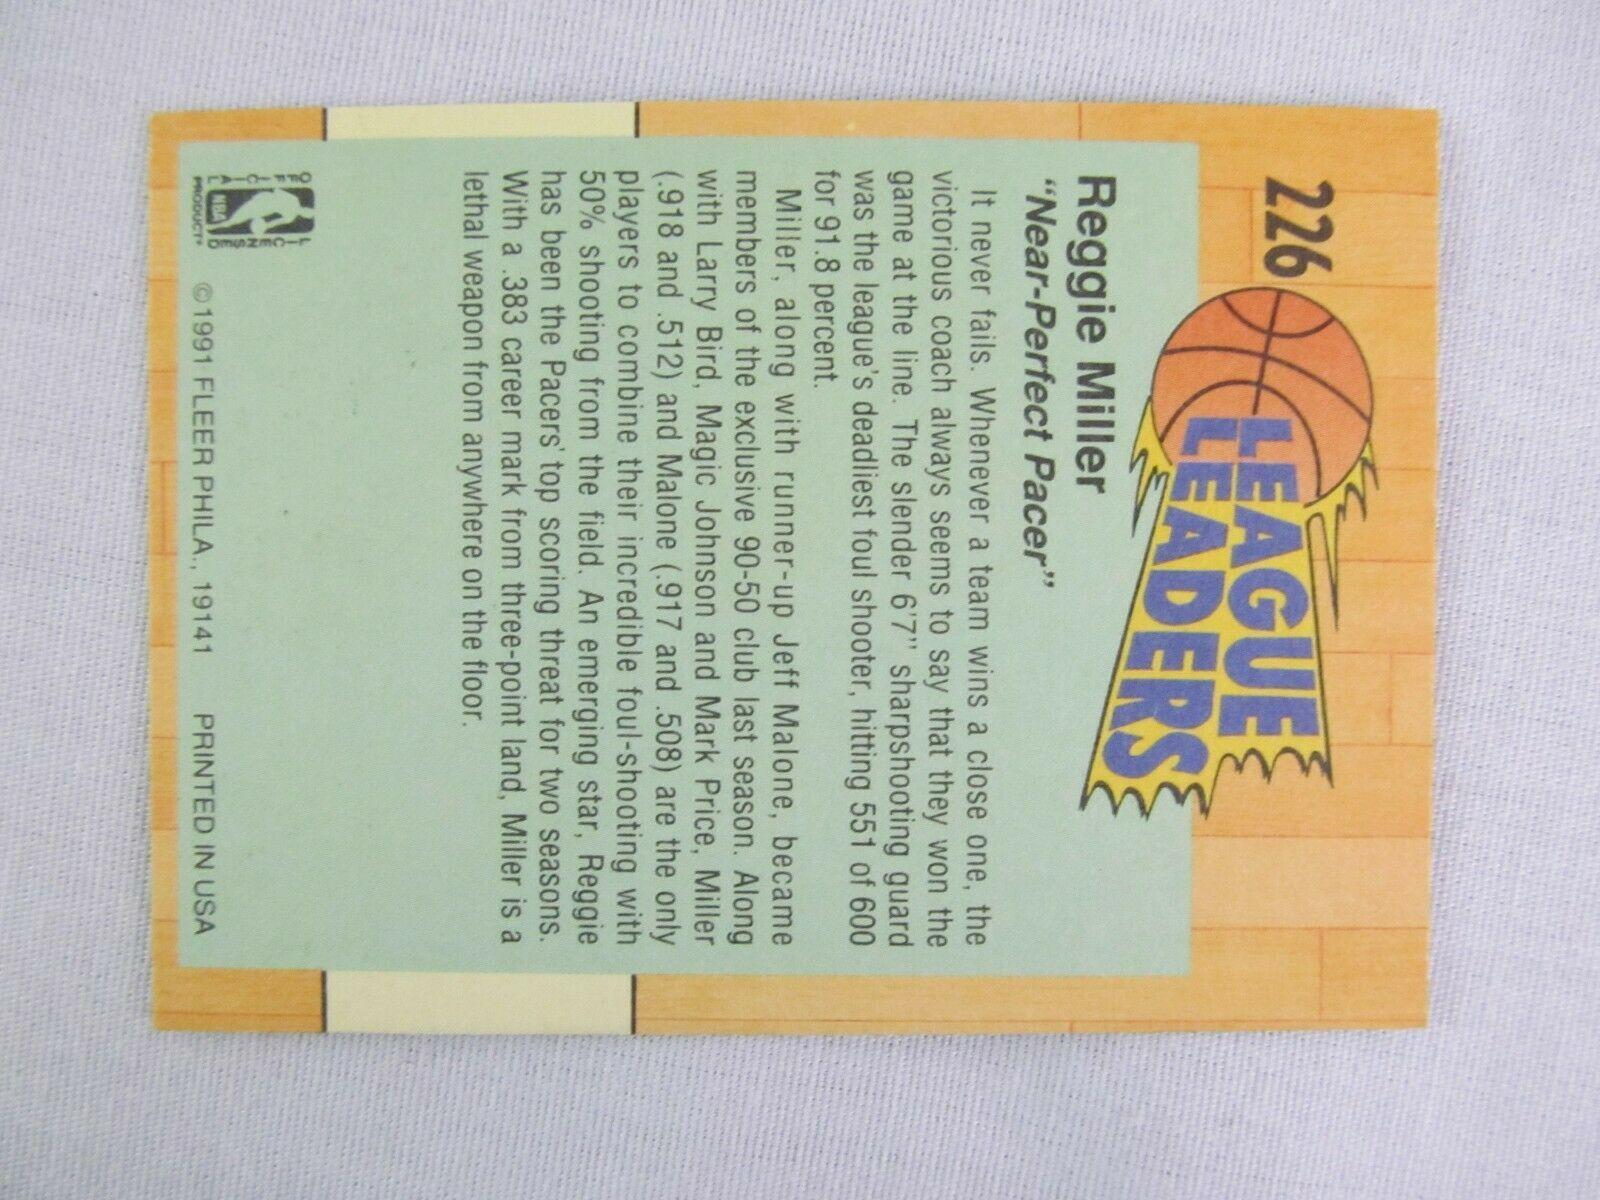 Reggie Miller Indiana Pacers 1991 Fleer Basketball Card 226